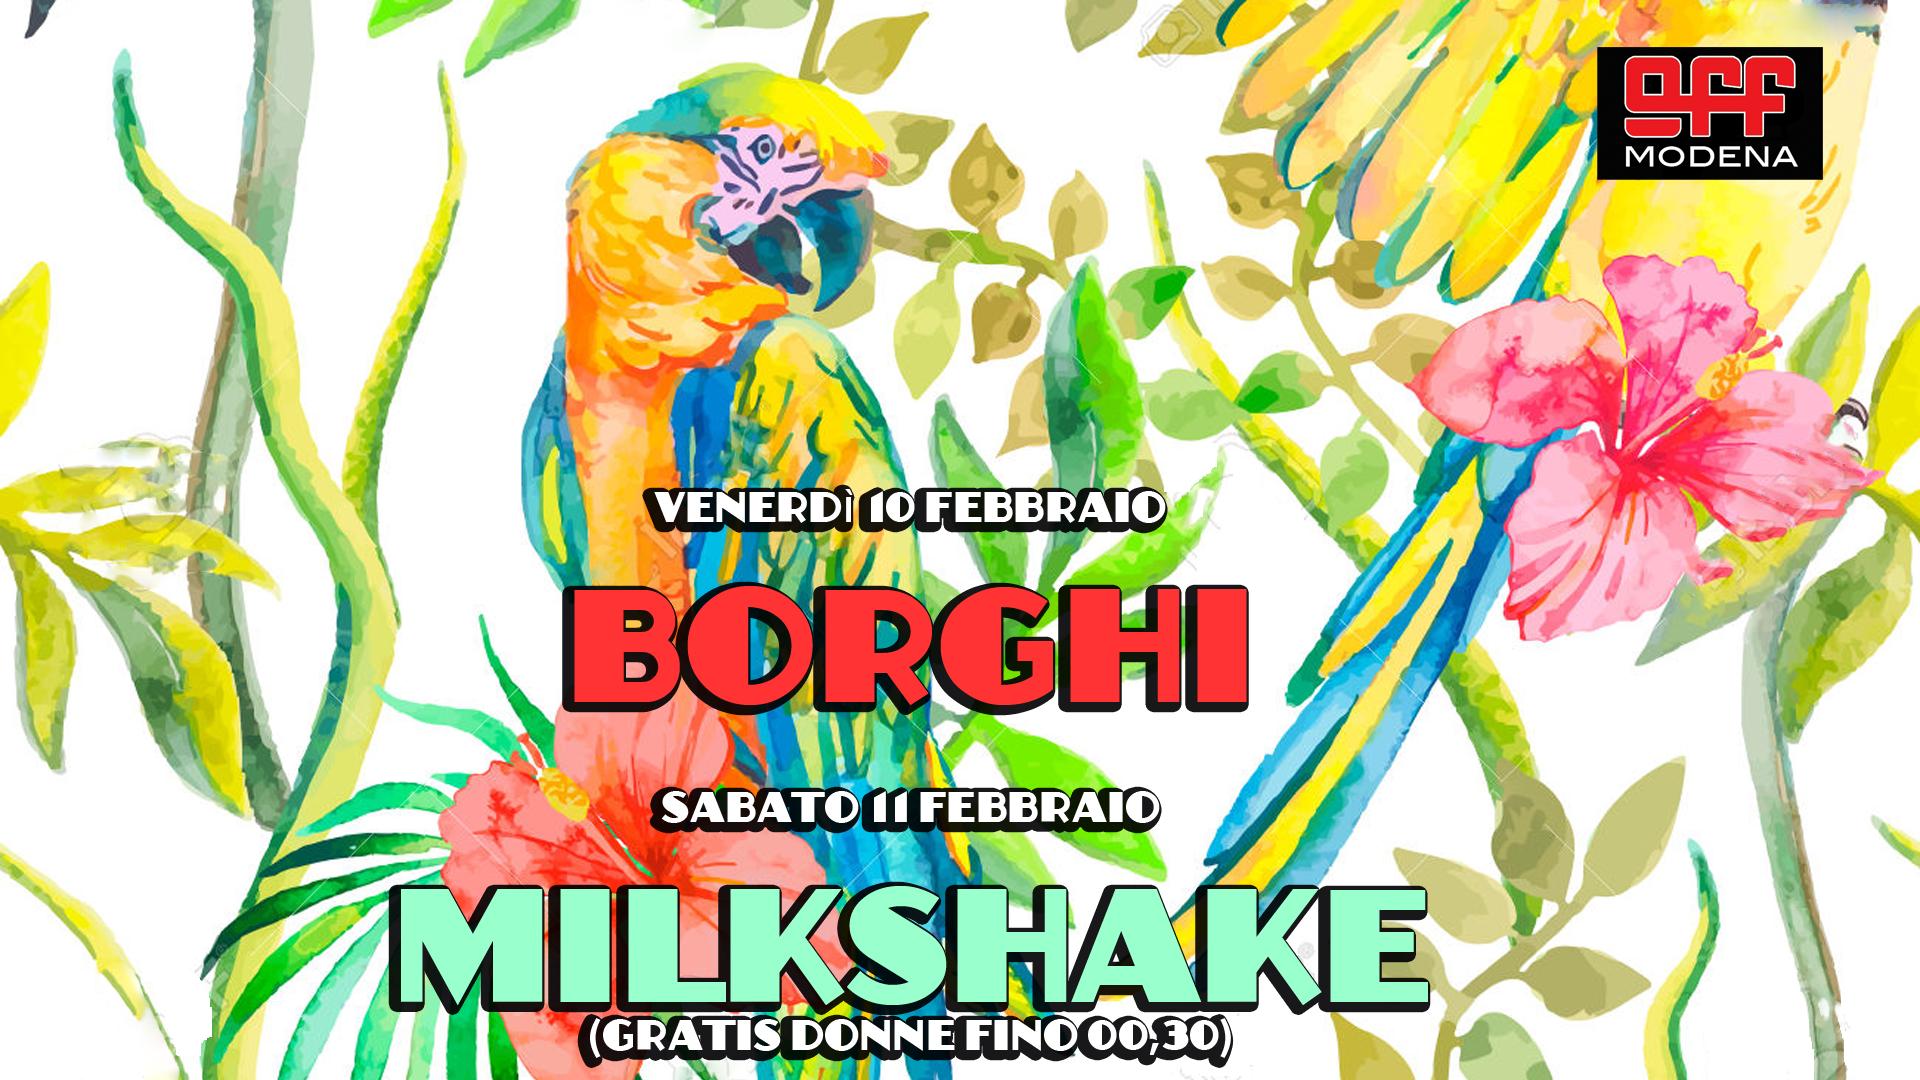 OFF Modena Borghi Milkshake bizzarri hiphop reggae